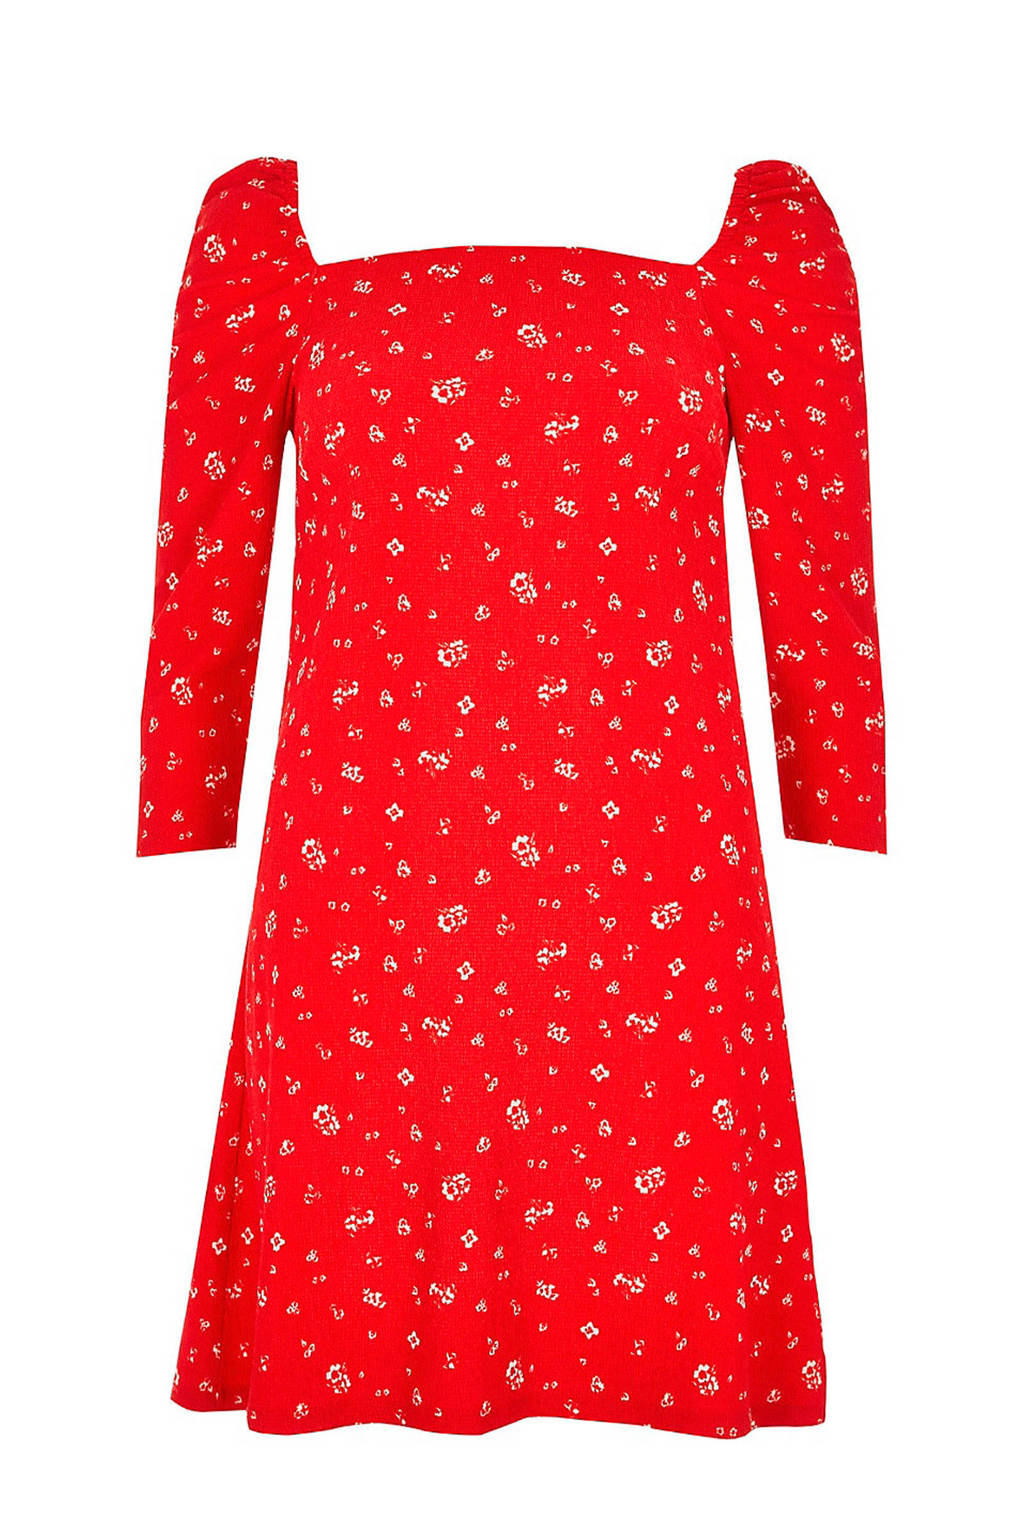 River Island jurk met bloemenprint, Rood